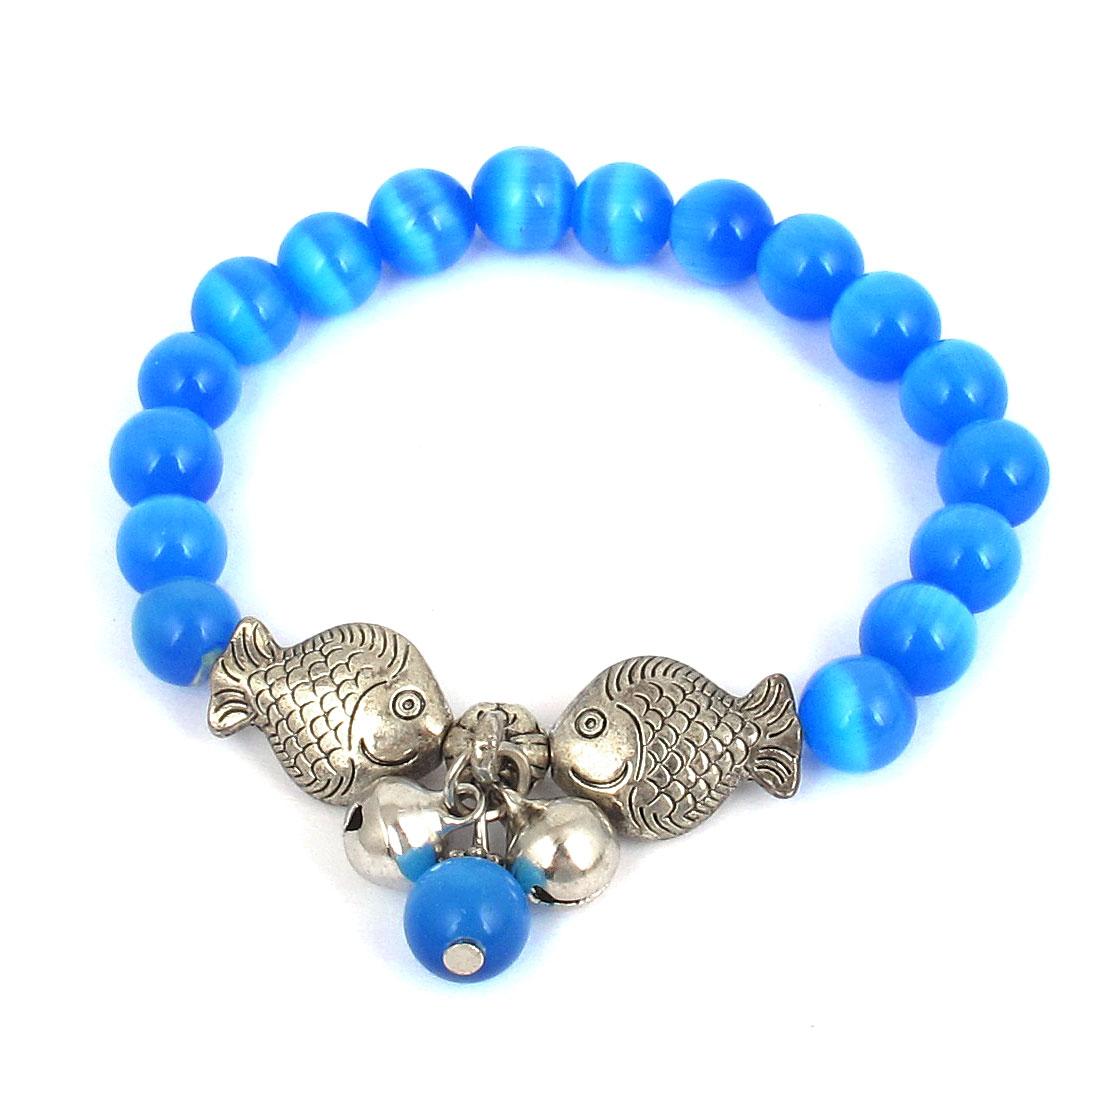 Fish Detail Round Opal Bead Wrist Ornament Bangle Bracelet Medium Blue Silver Tone for Women